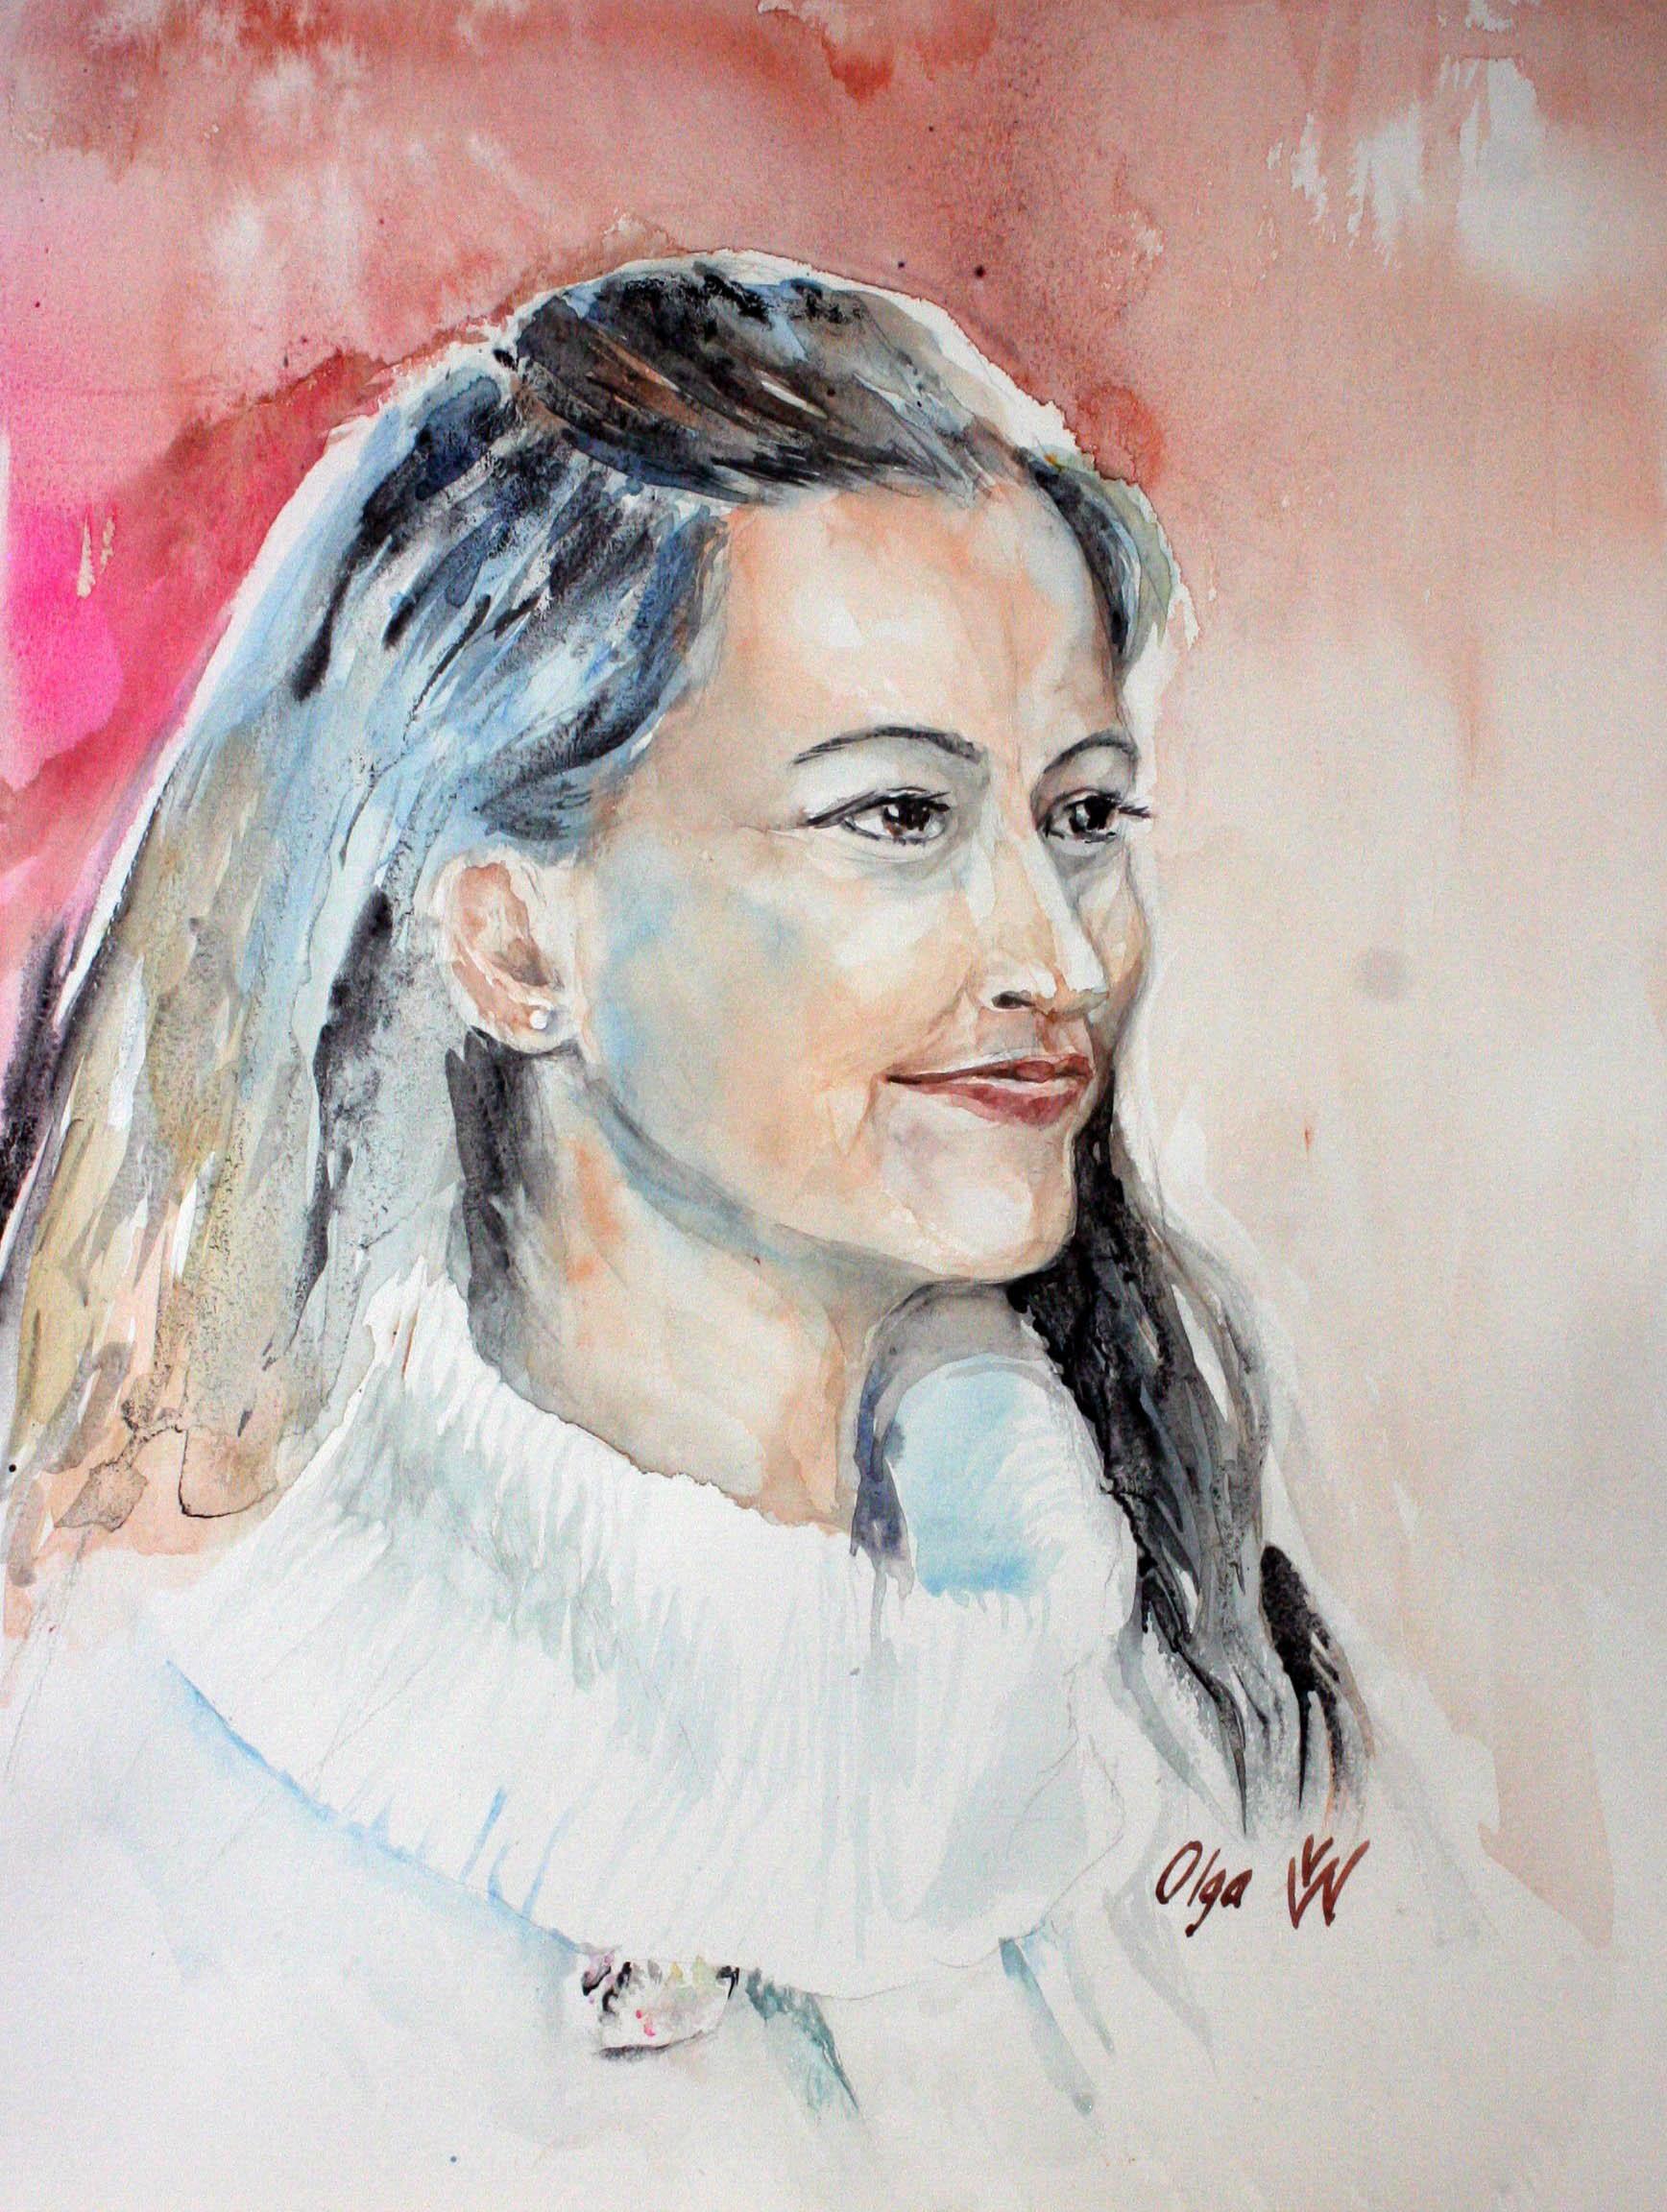 Olga Weinstein did this watercolor.